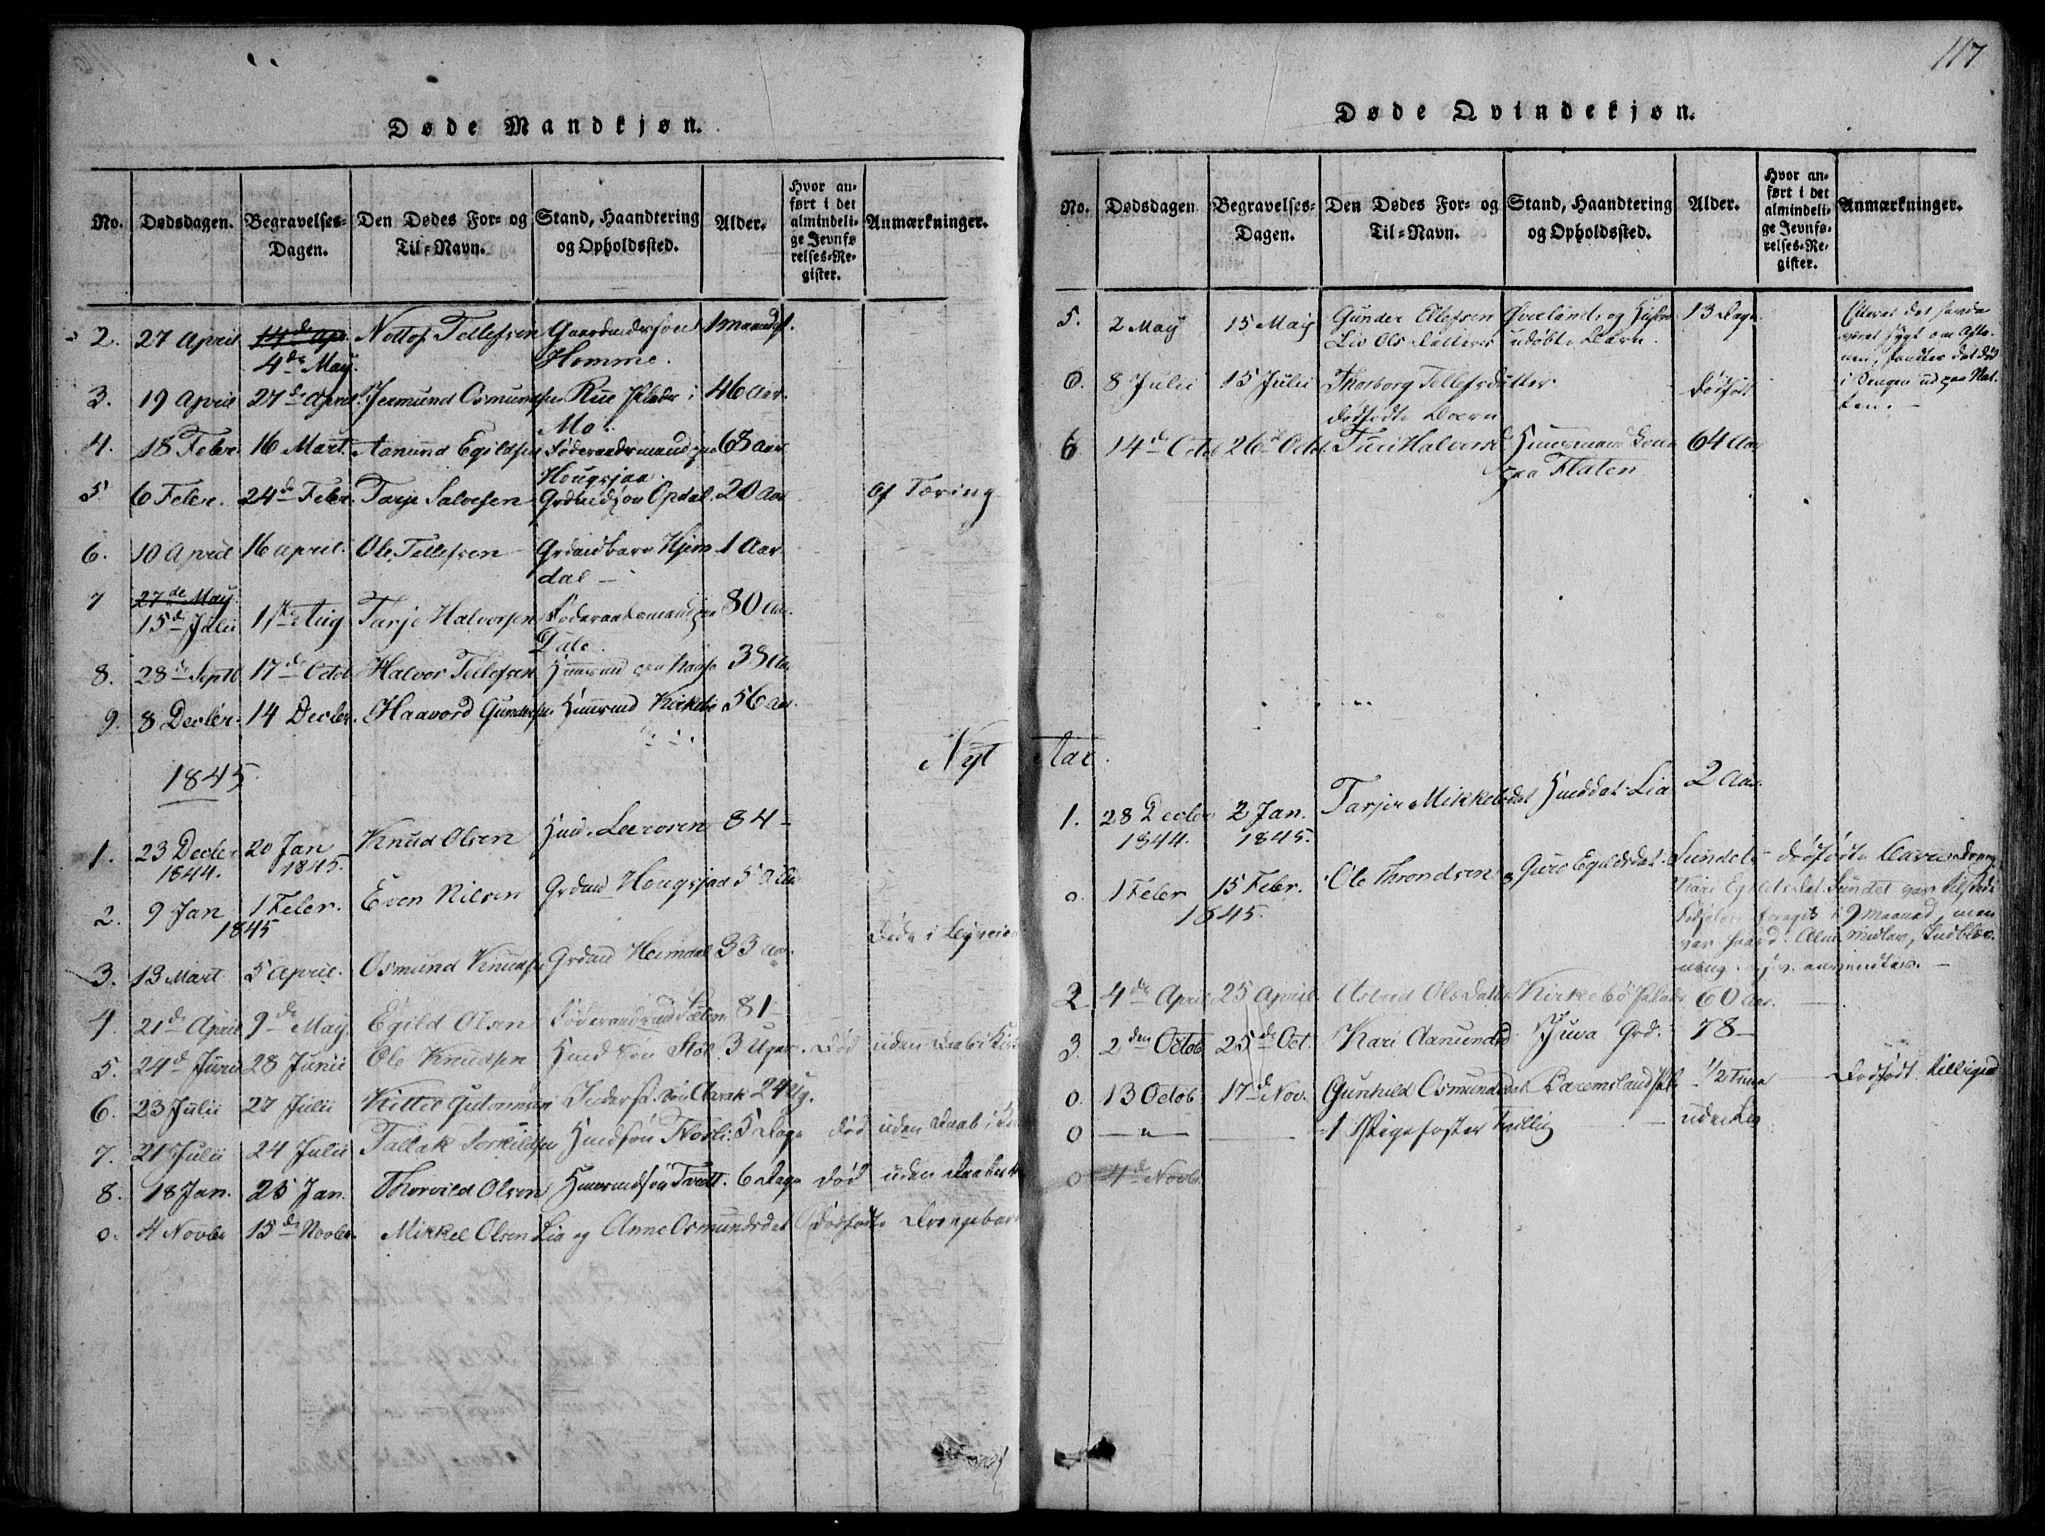 SAKO, Nissedal kirkebøker, F/Fb/L0001: Ministerialbok nr. II 1, 1814-1845, s. 117